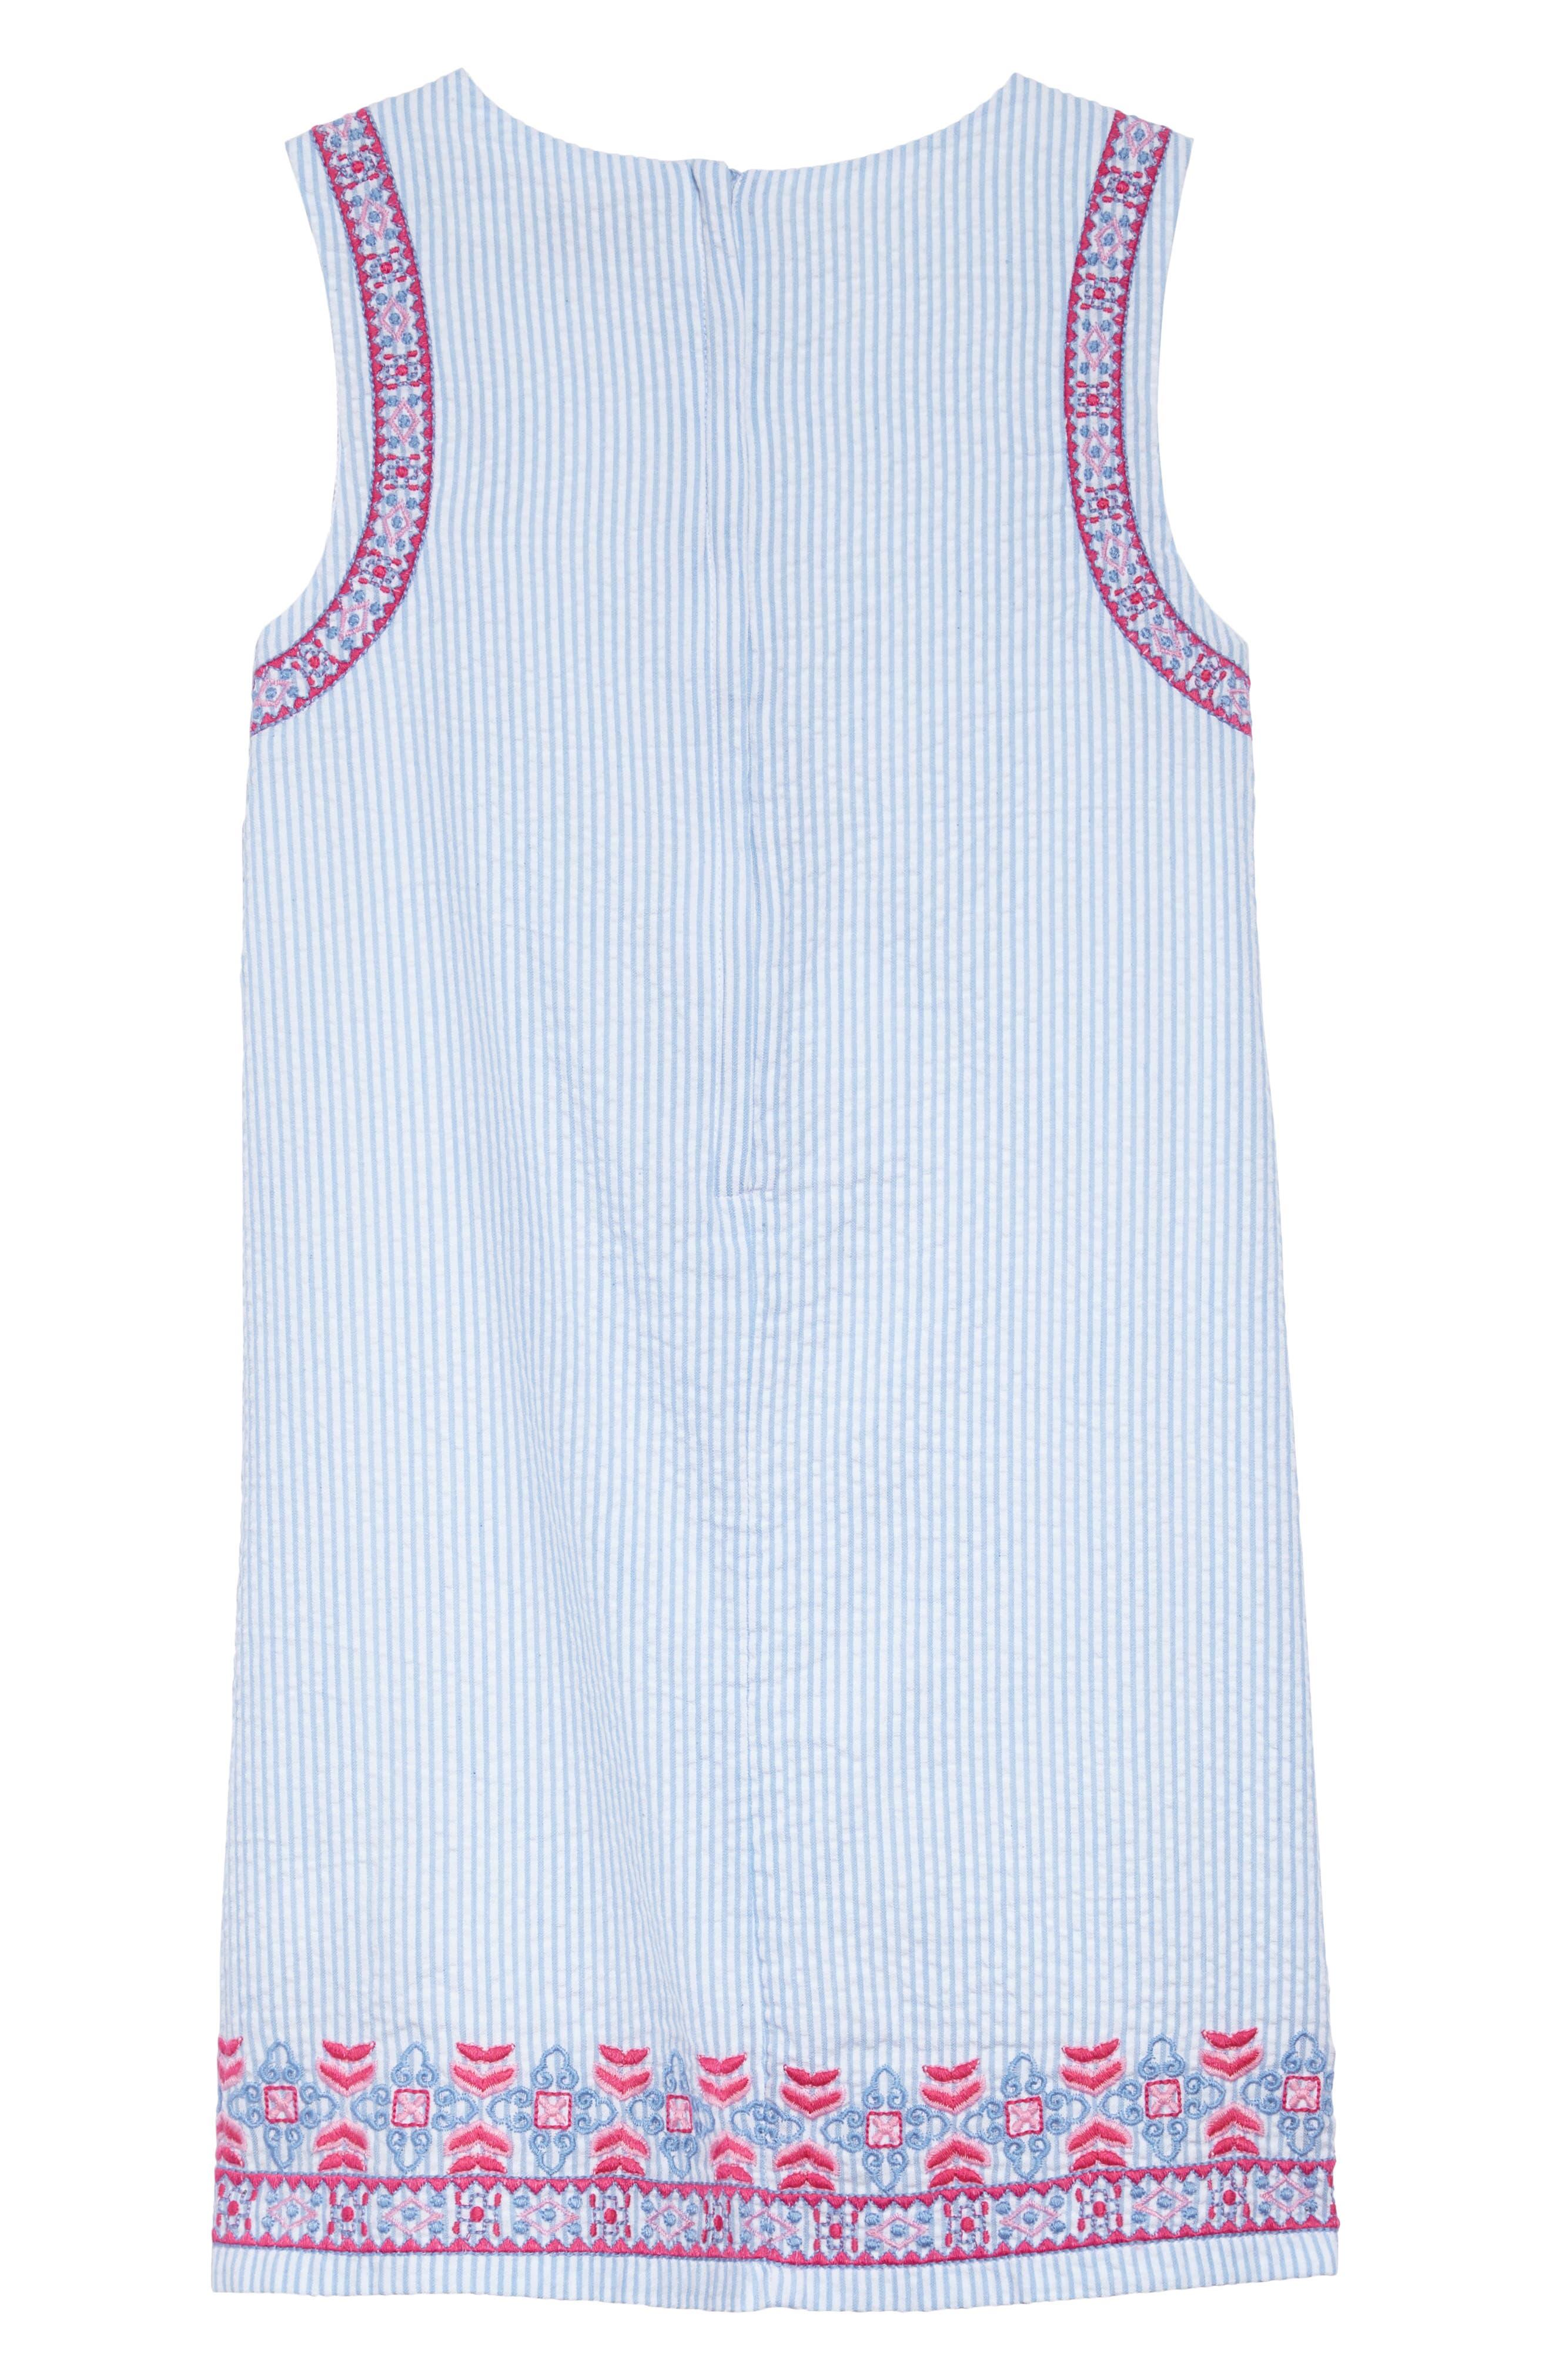 Embroidered Seersucker Shift Dress,                             Alternate thumbnail 2, color,                             Ocean Breeze